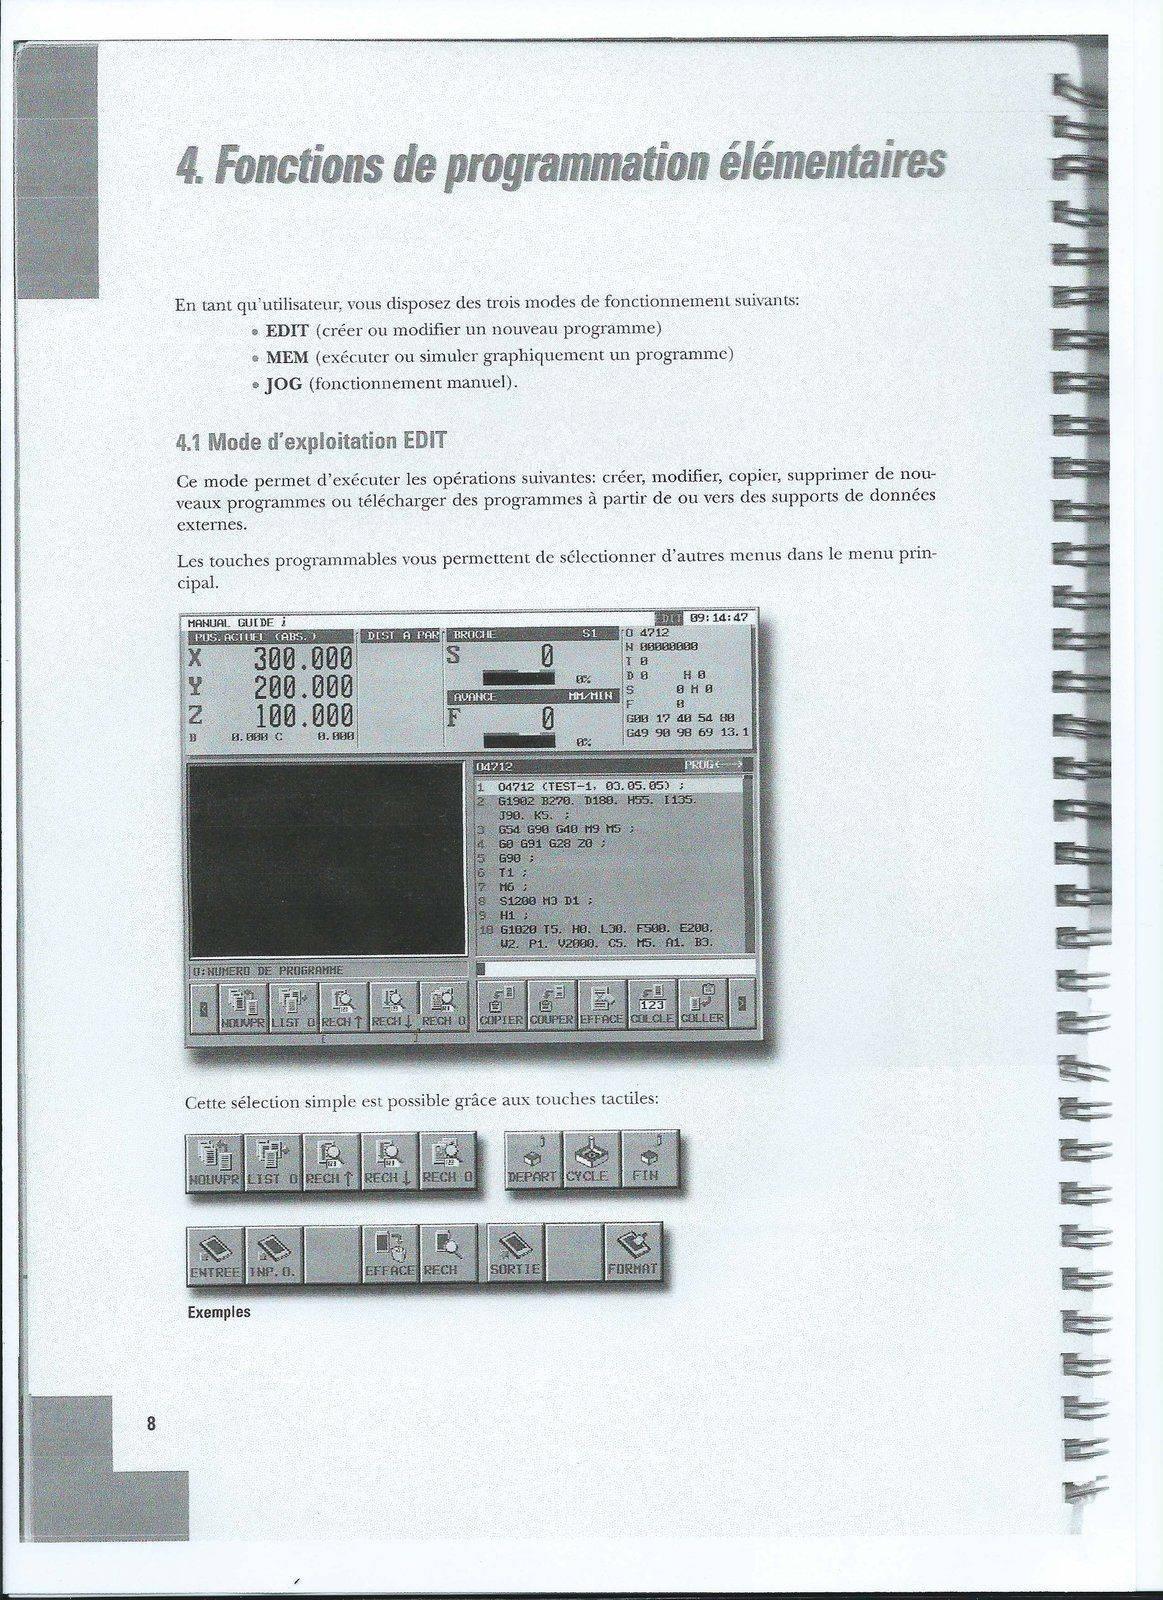 manuel guide 4.jpg